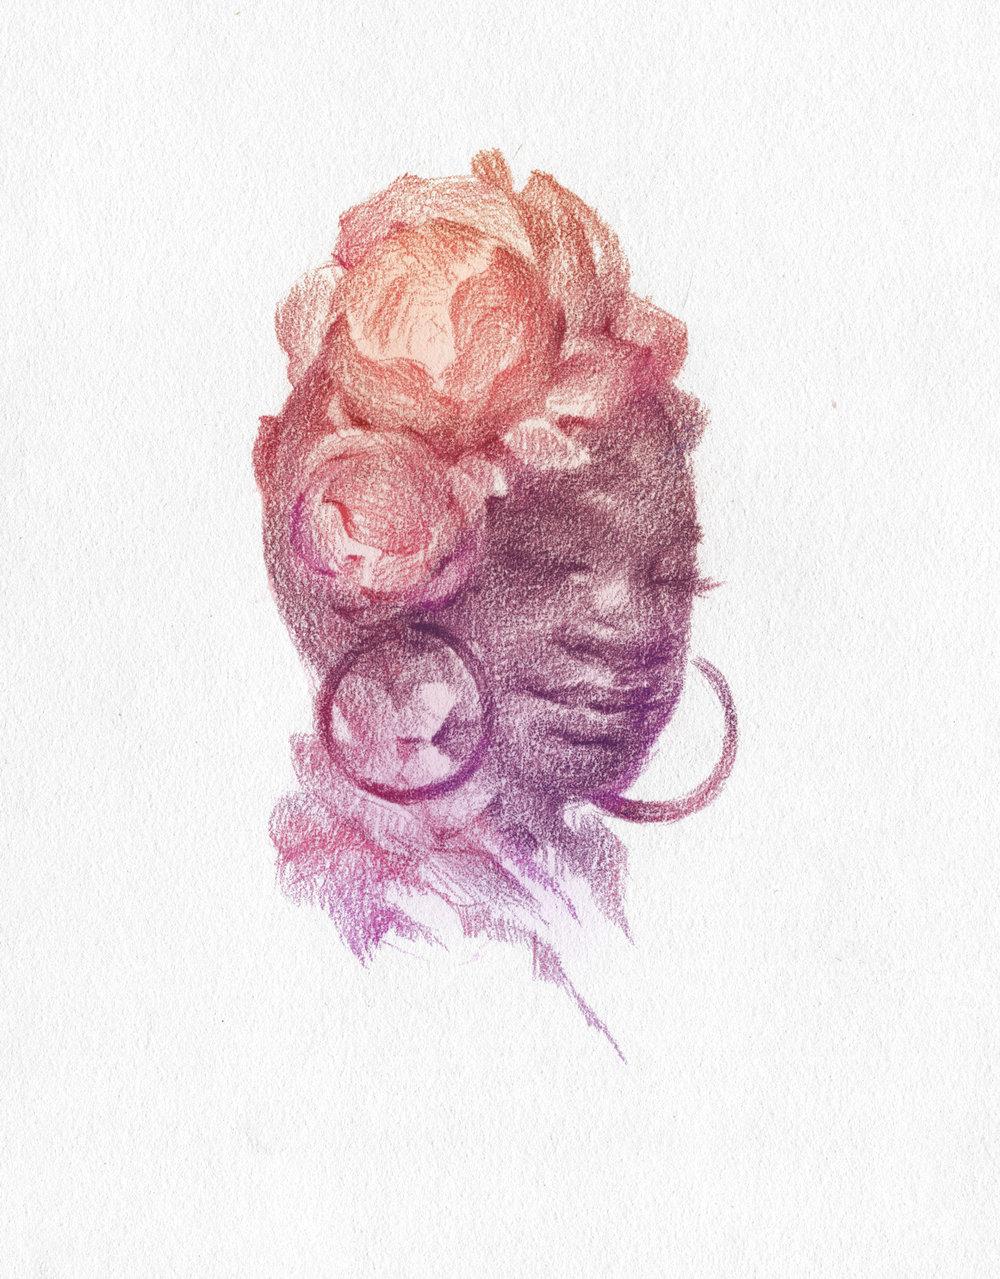 African Woman in Head Wrap - Portrait in pencil by Laura Dreyer